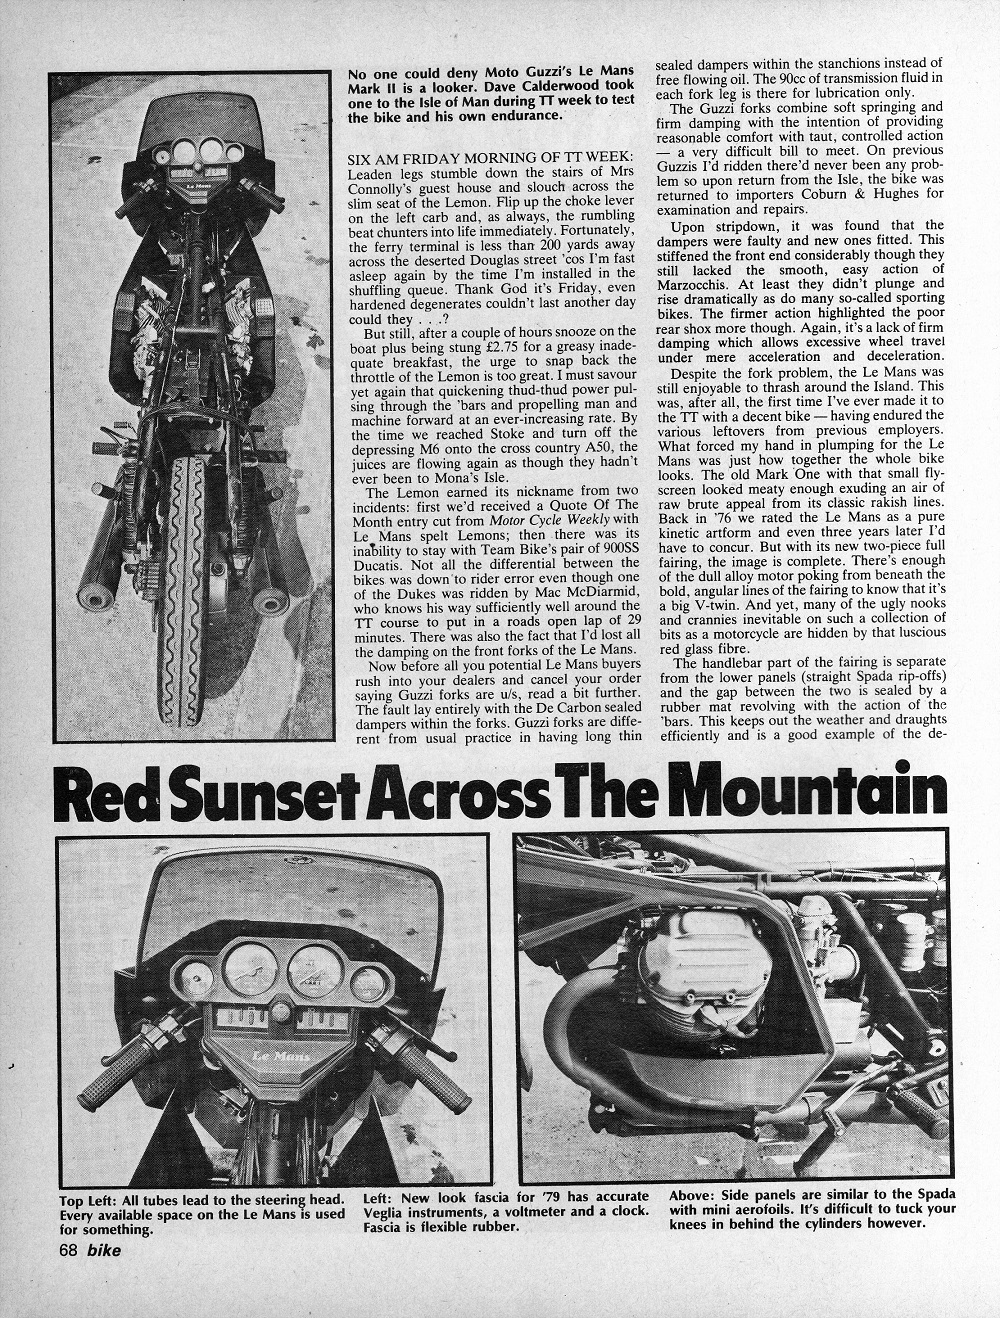 1979 Moto Guzzi Le Mans MK II road test.1.jpg